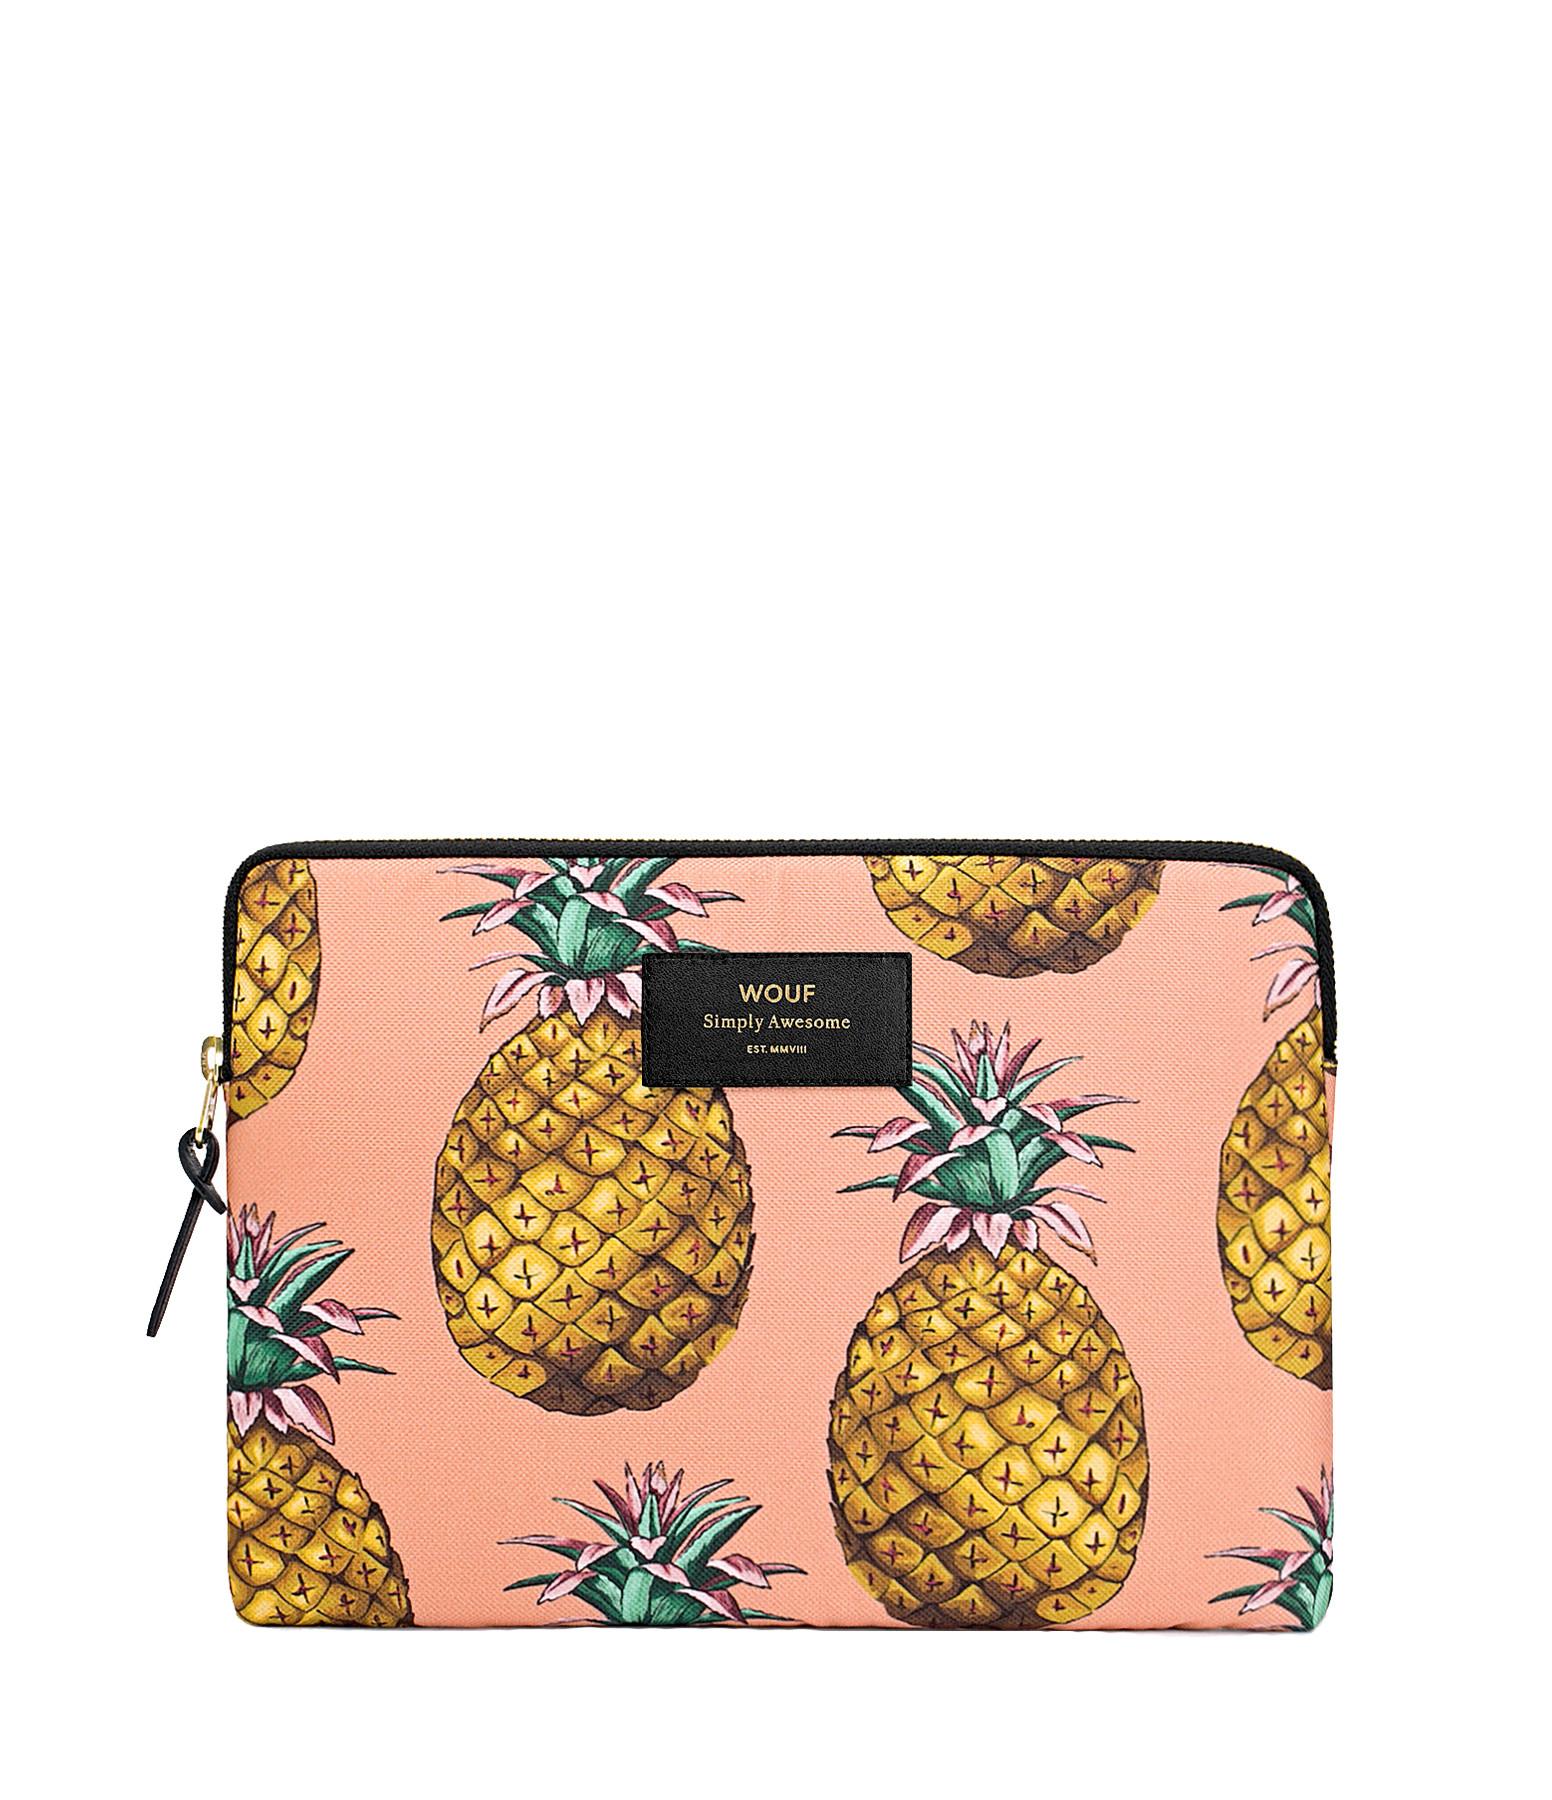 WOUF - Housse Ipad Ananas